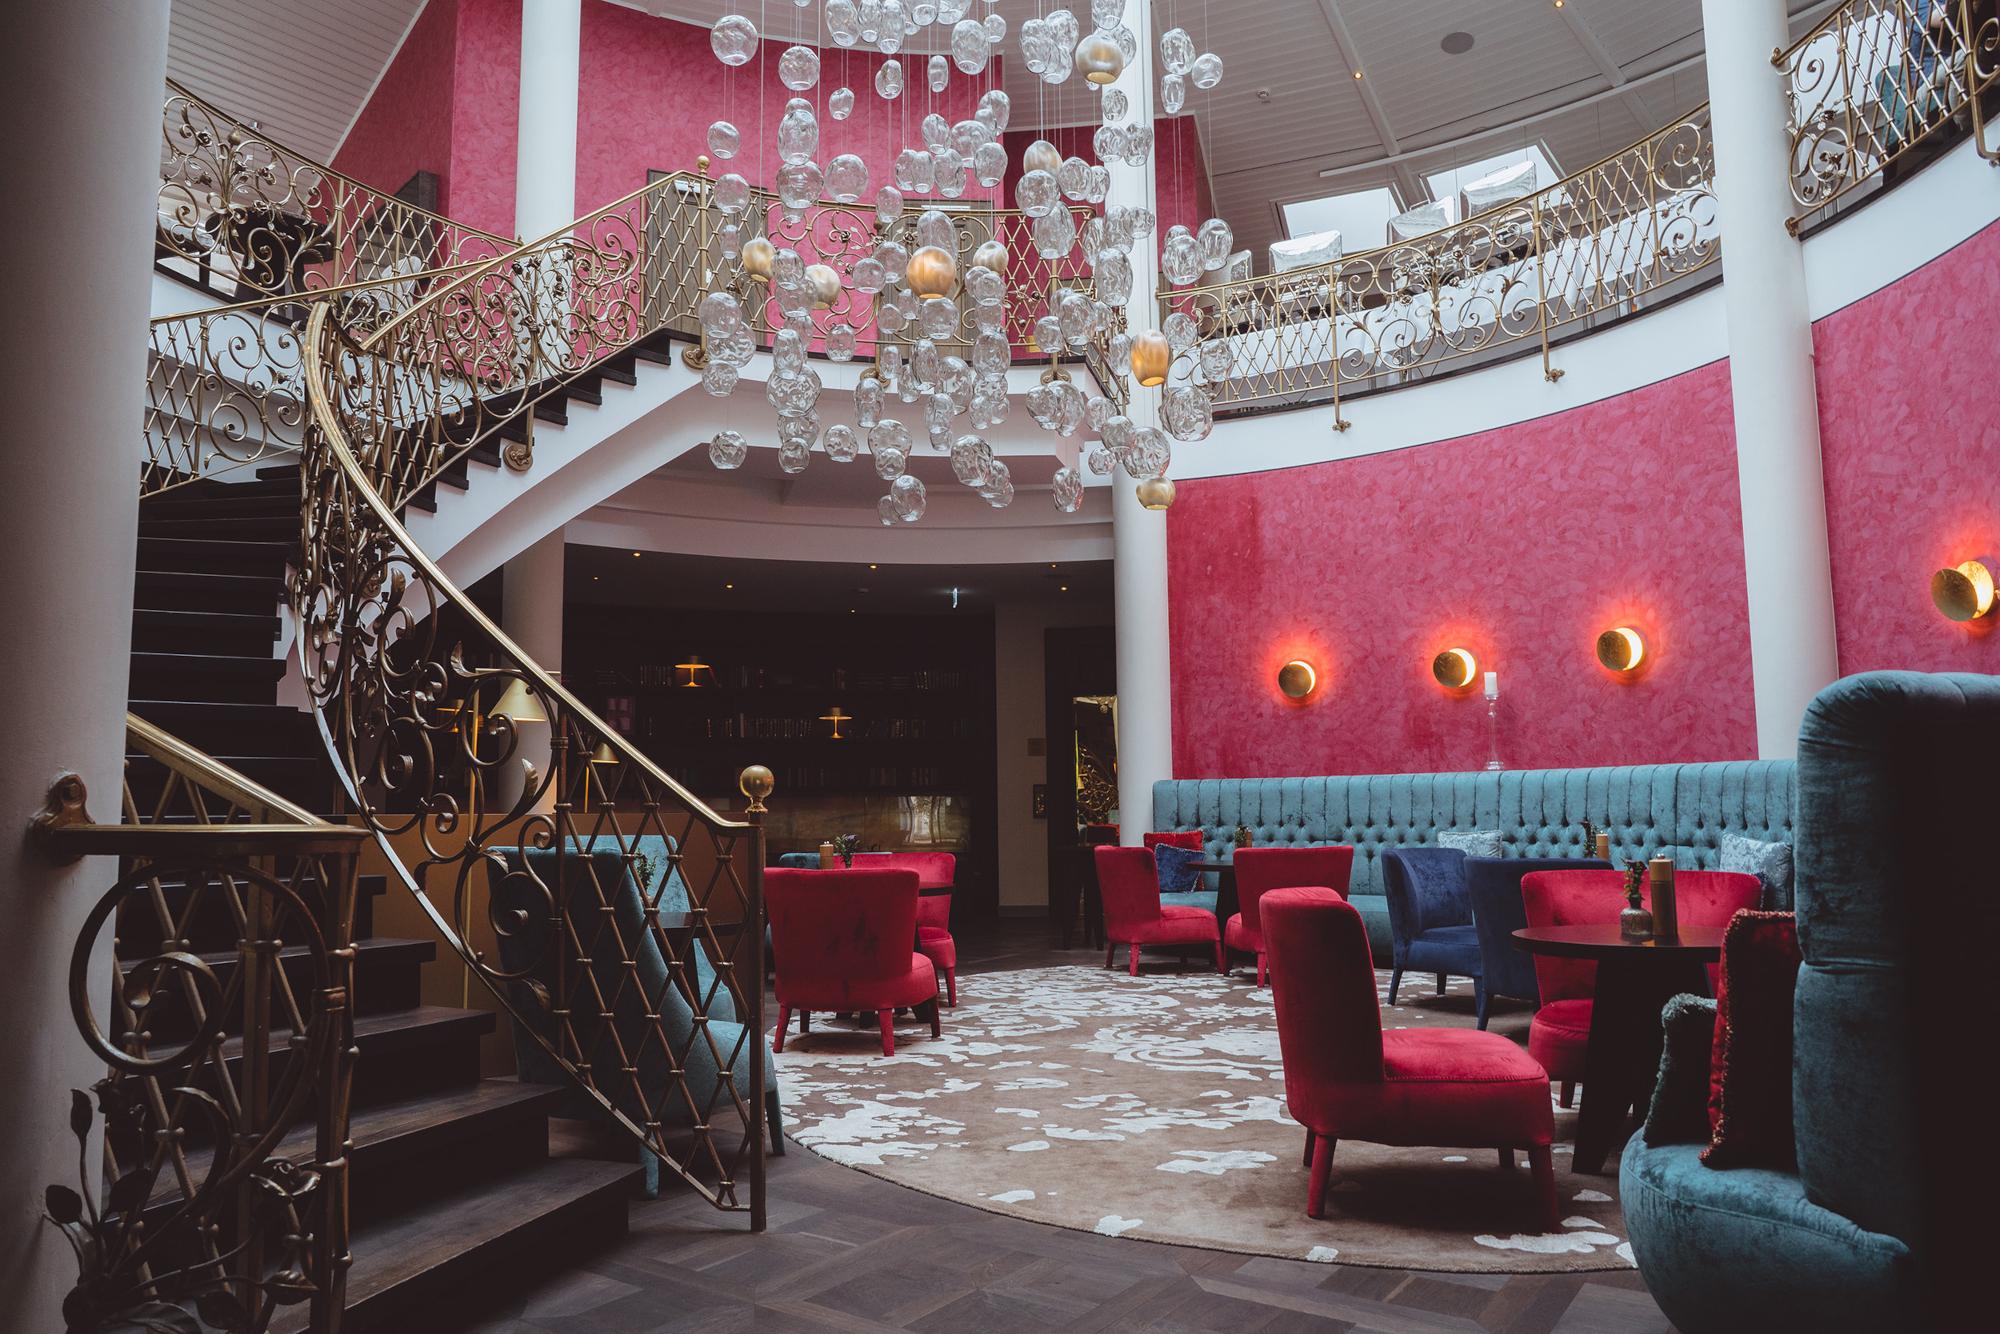 Marburg_Hotel VILA VITA Rosenpark_treppe.jpg